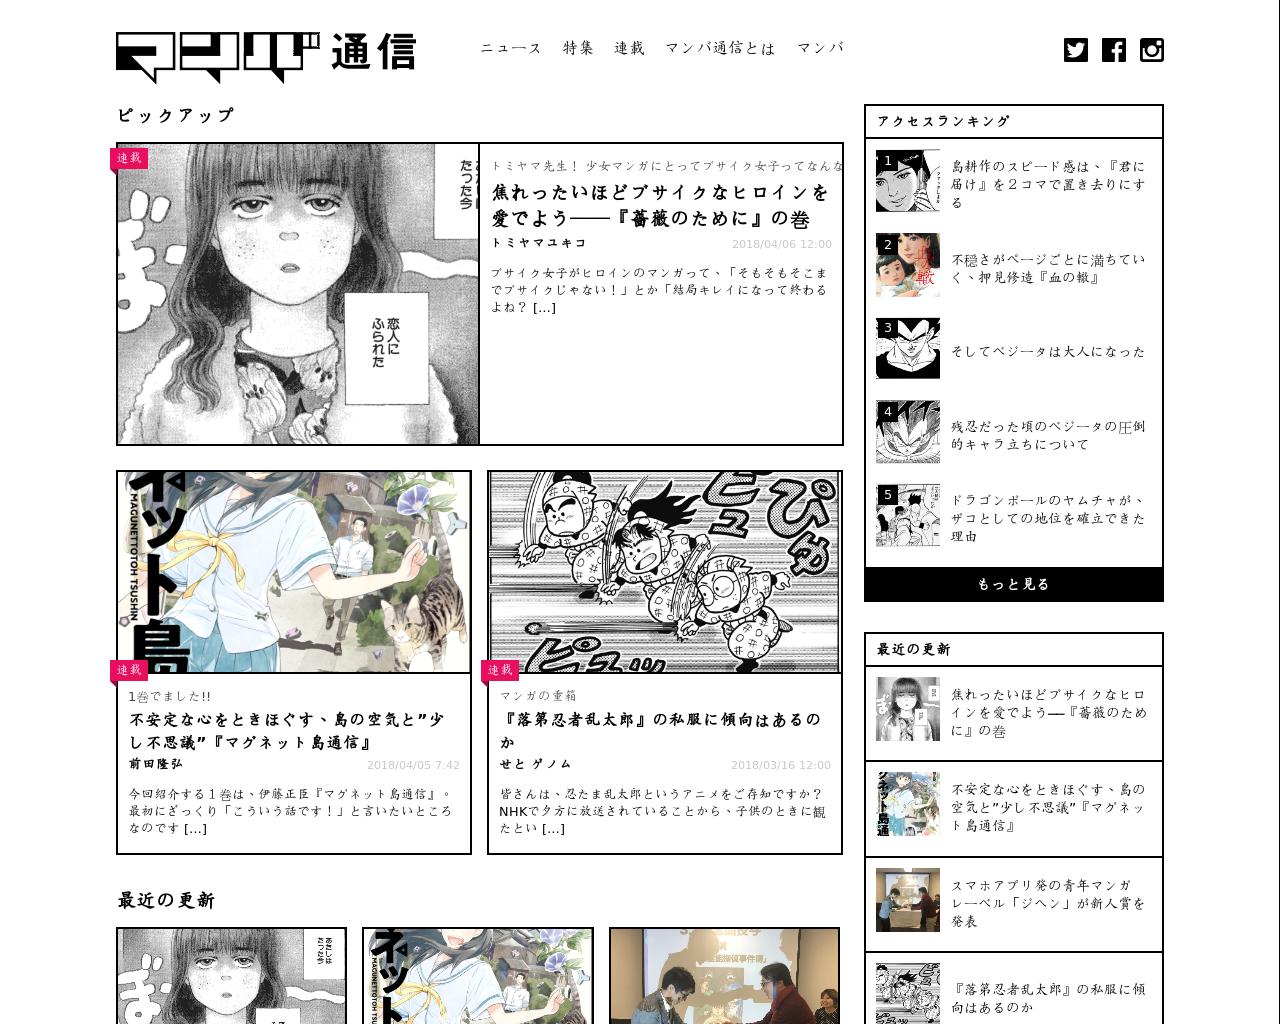 magazine.manba.co.jp(2018/04/16 13:10:42)